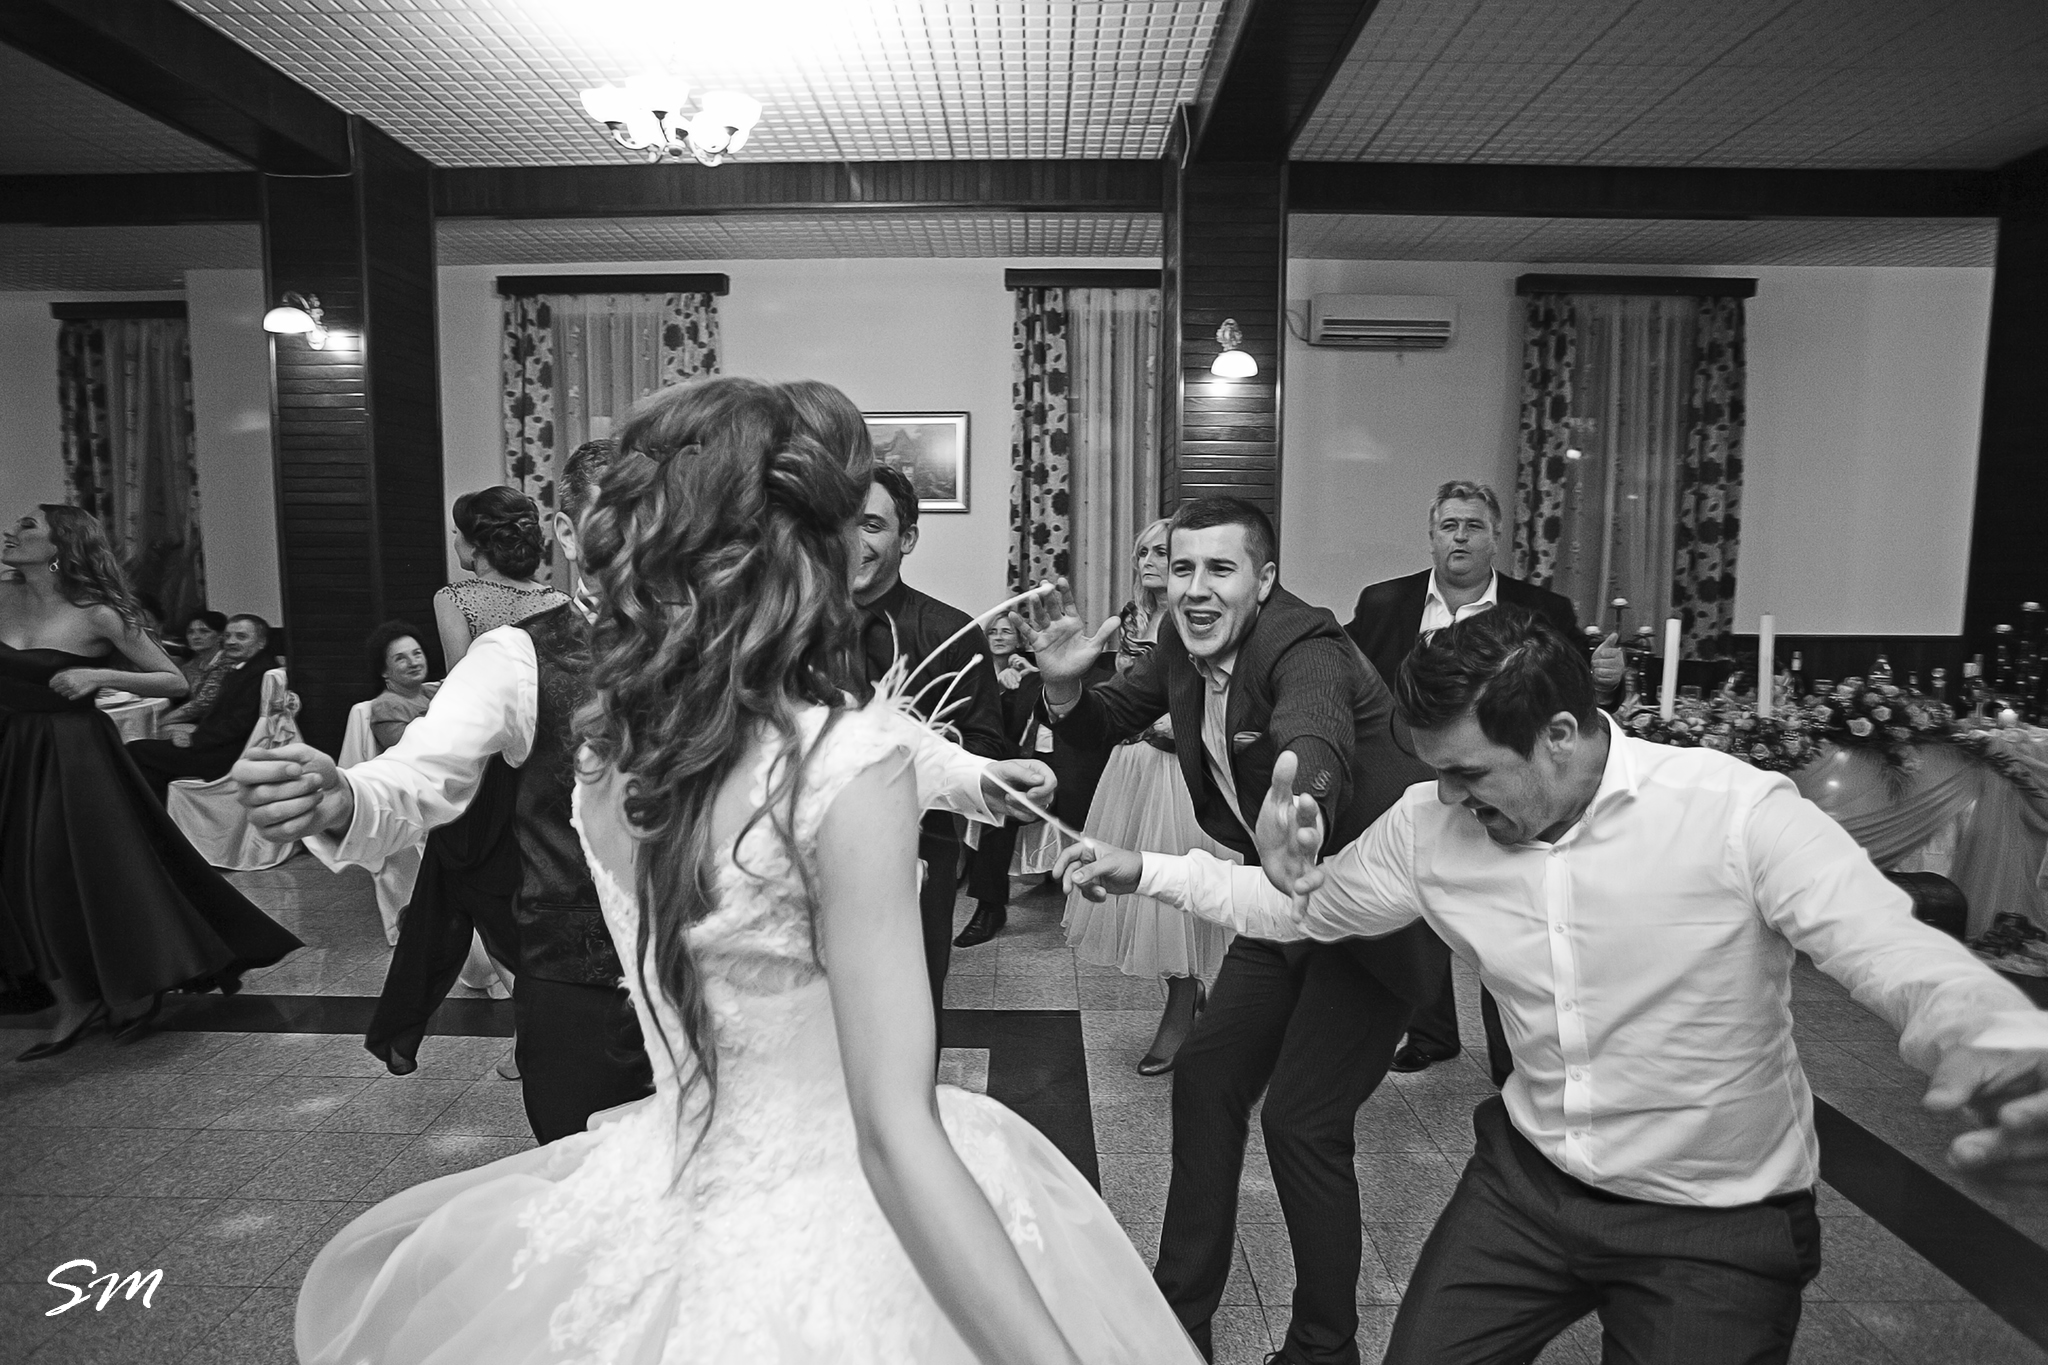 fotograf_nunta_profesionist_suceava (34)